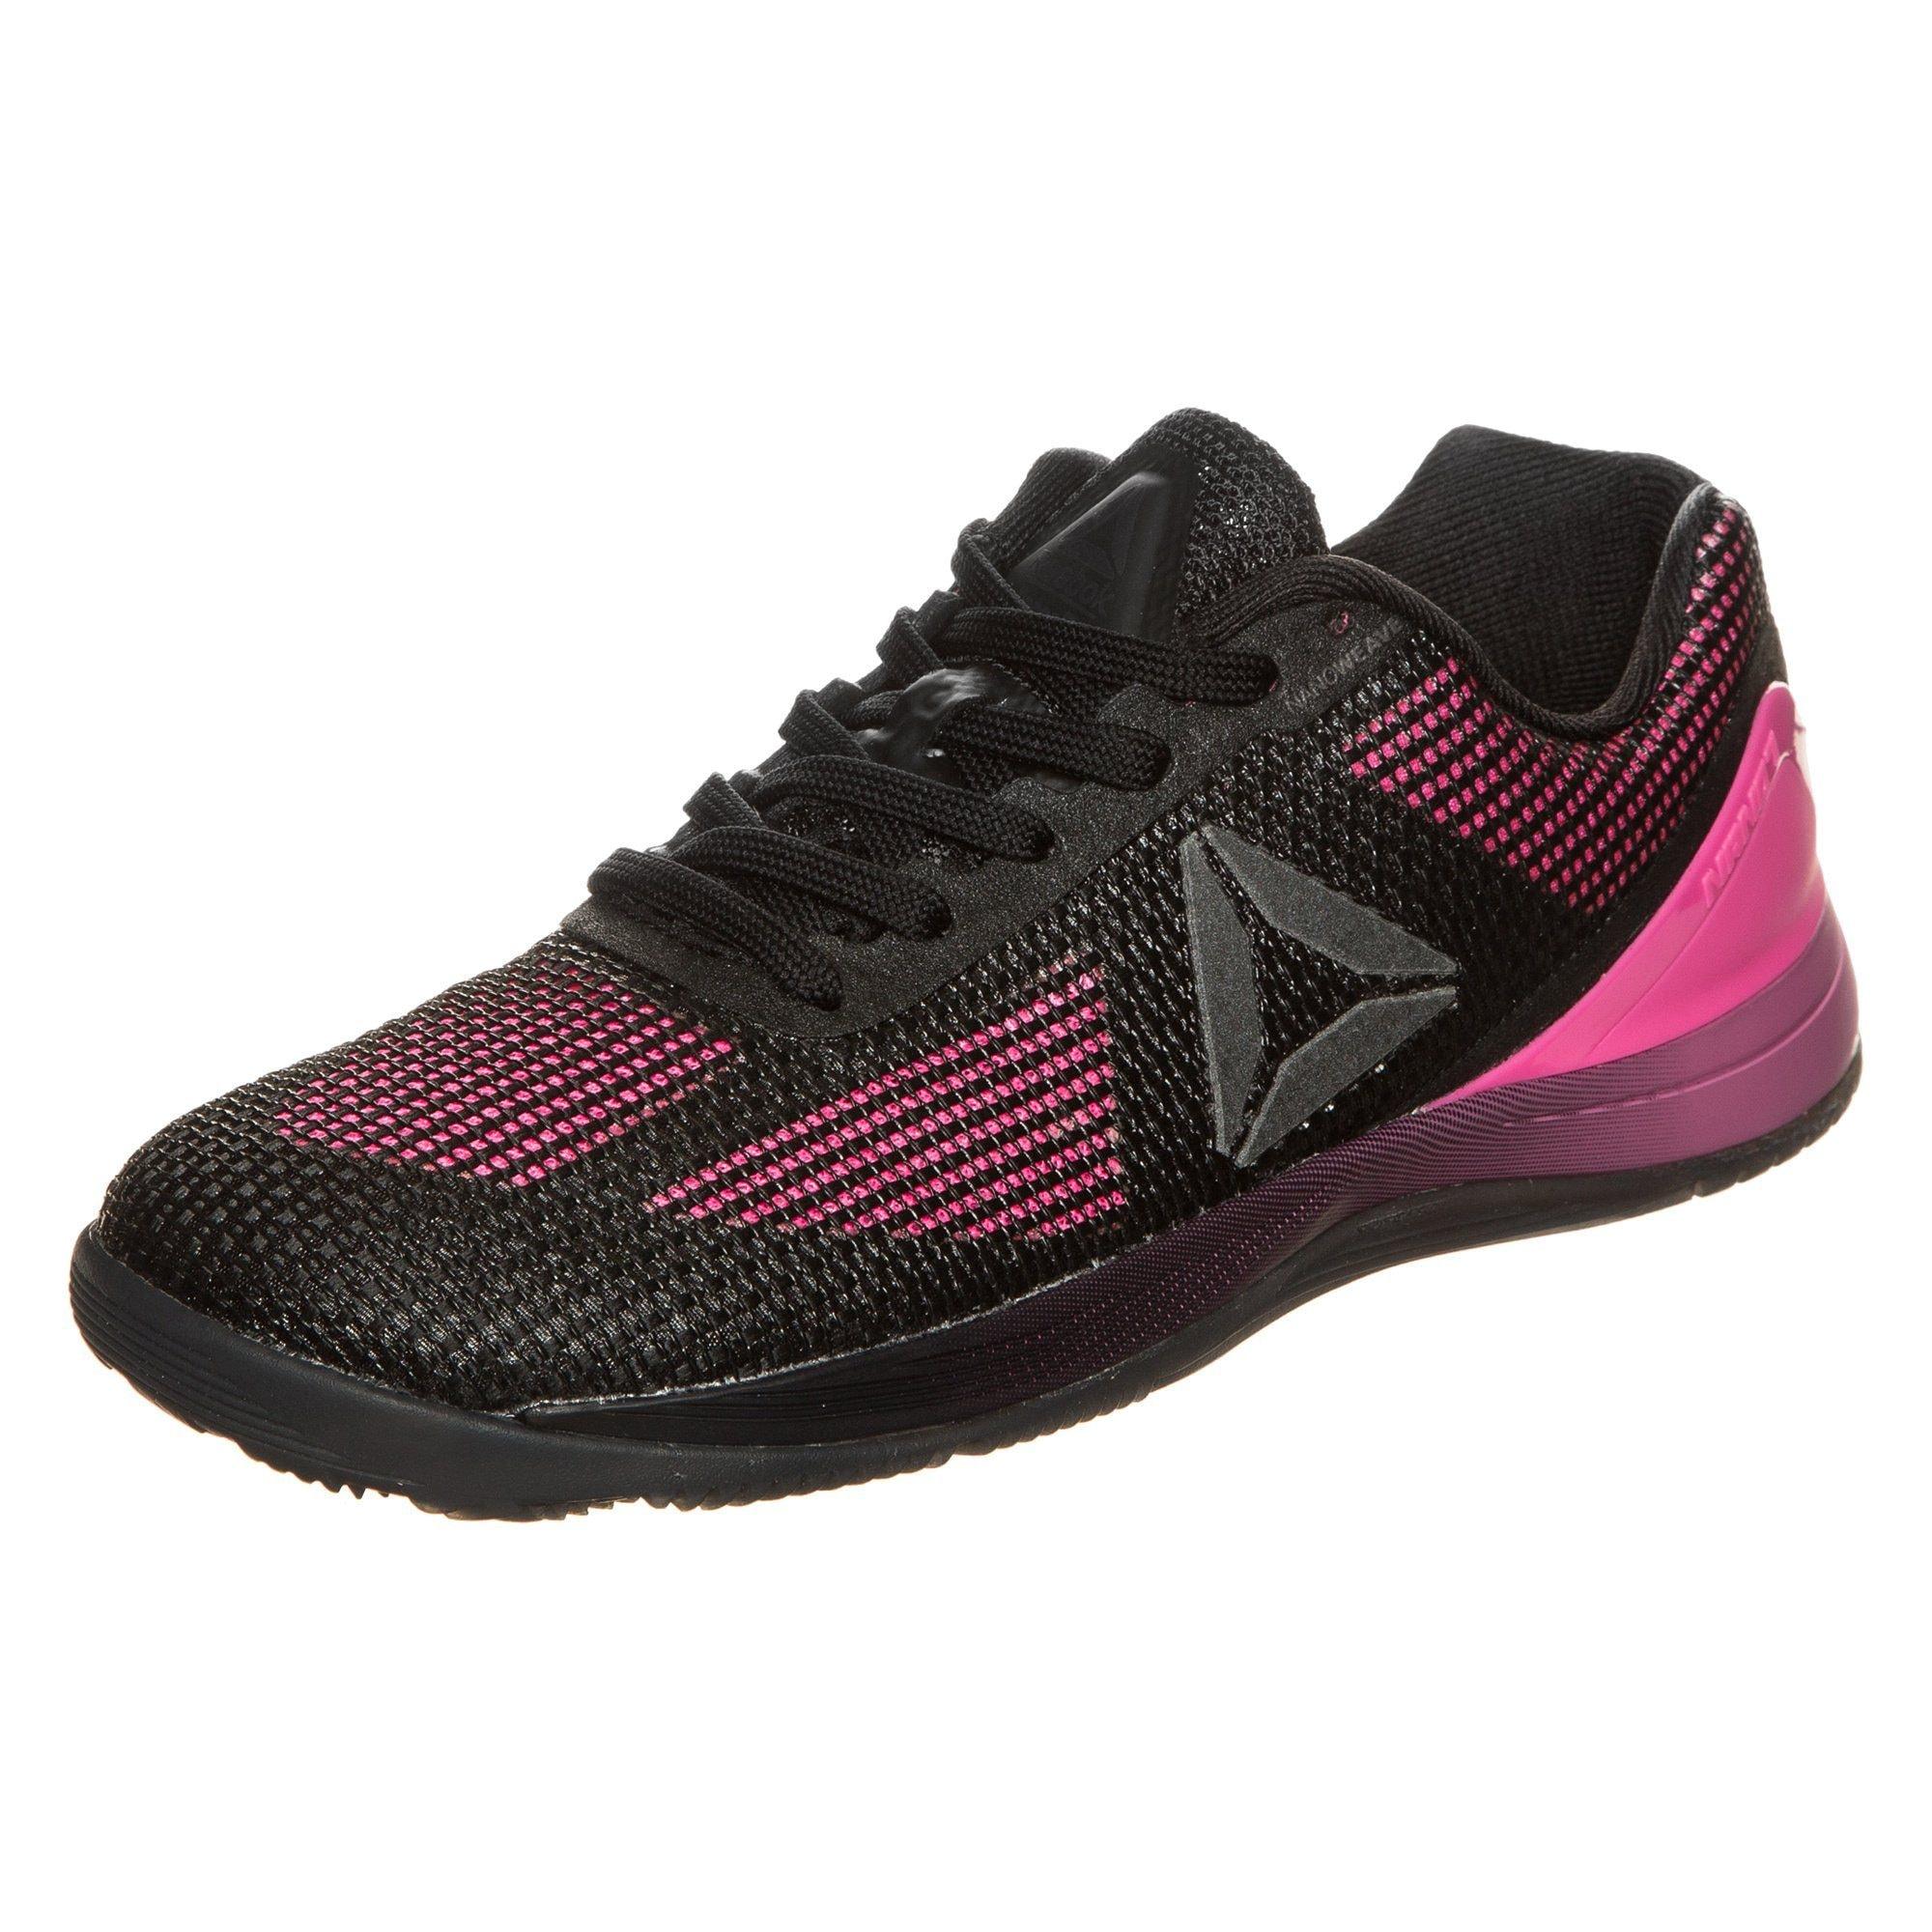 REEBOK CrossFit Nano 7.0 Trainingsschuh Damen kaufen | BAUR